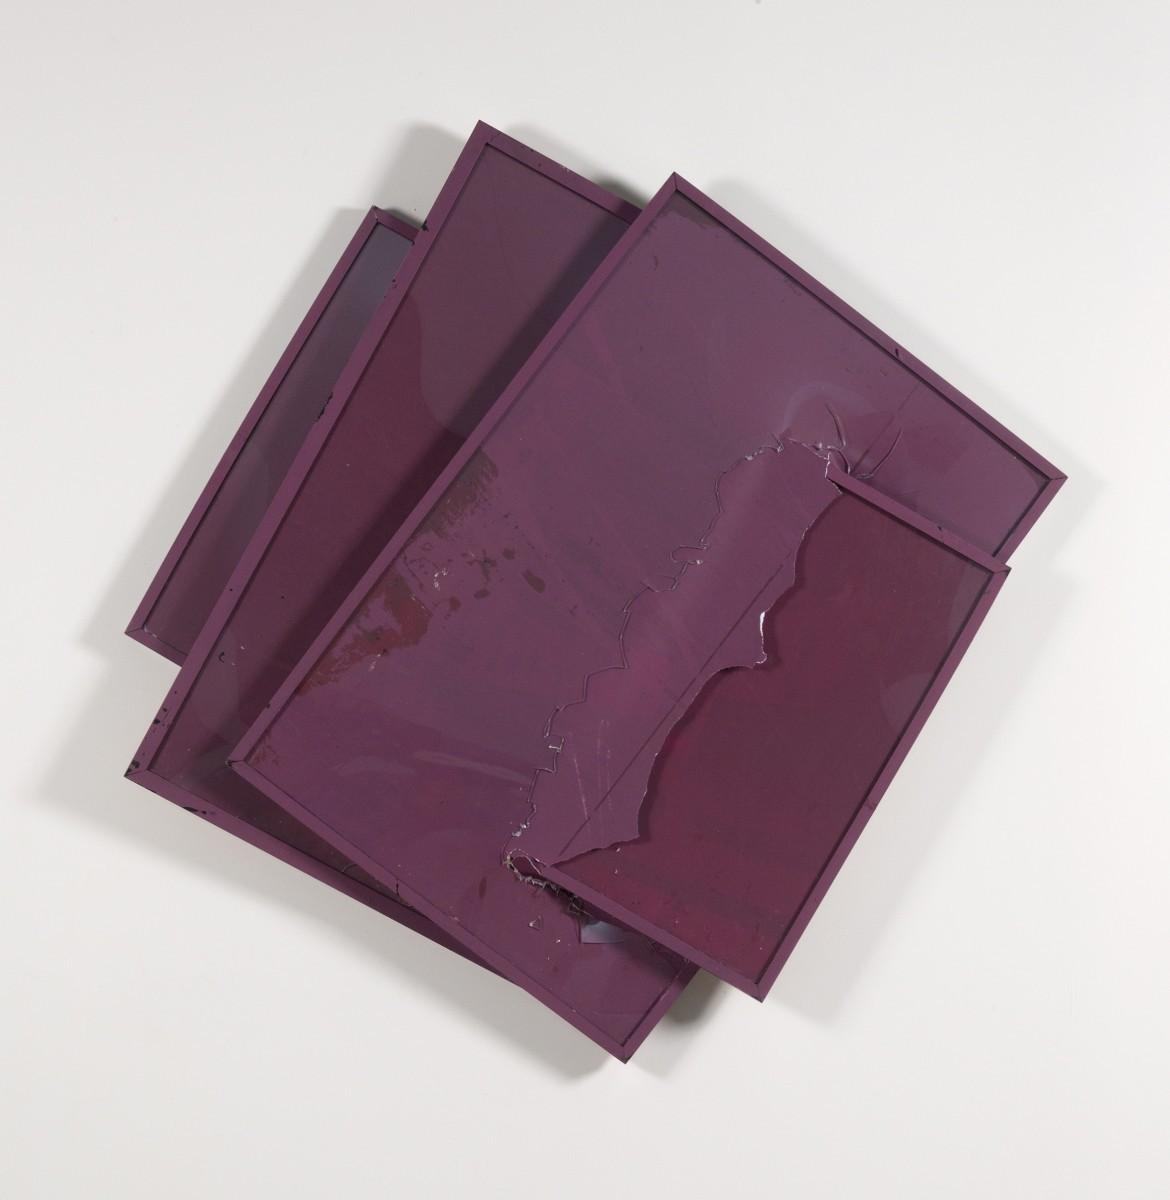 Brendan Fowler, To be Titled, 2013, silkscreen on archival inkjet prints, silkscreen on frames, plexiglas, 122x127x10 cm